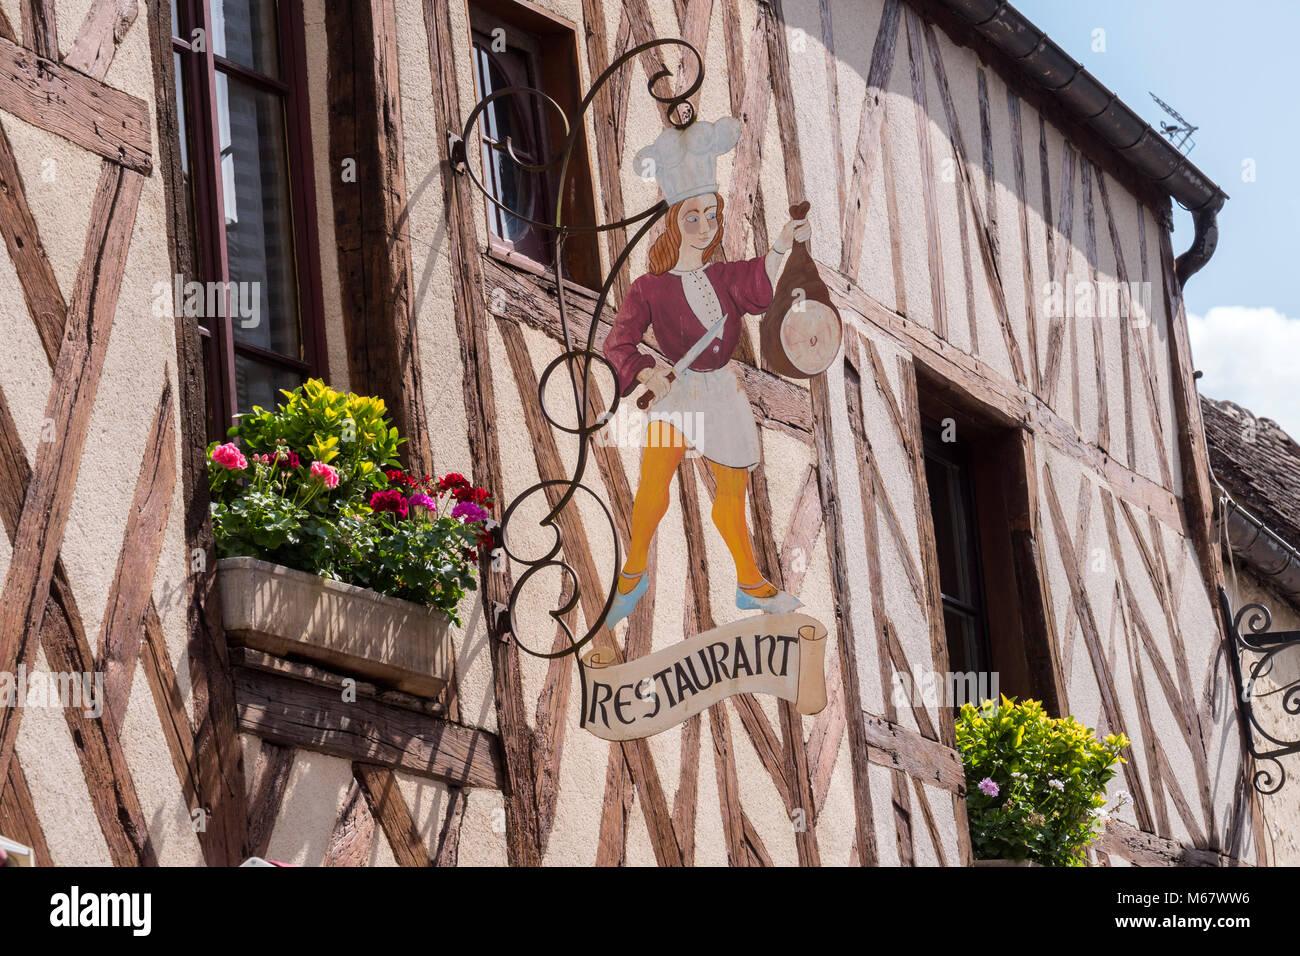 Cite Medieval Provins Seine-et-Marne Ile-de-France France - Stock Image